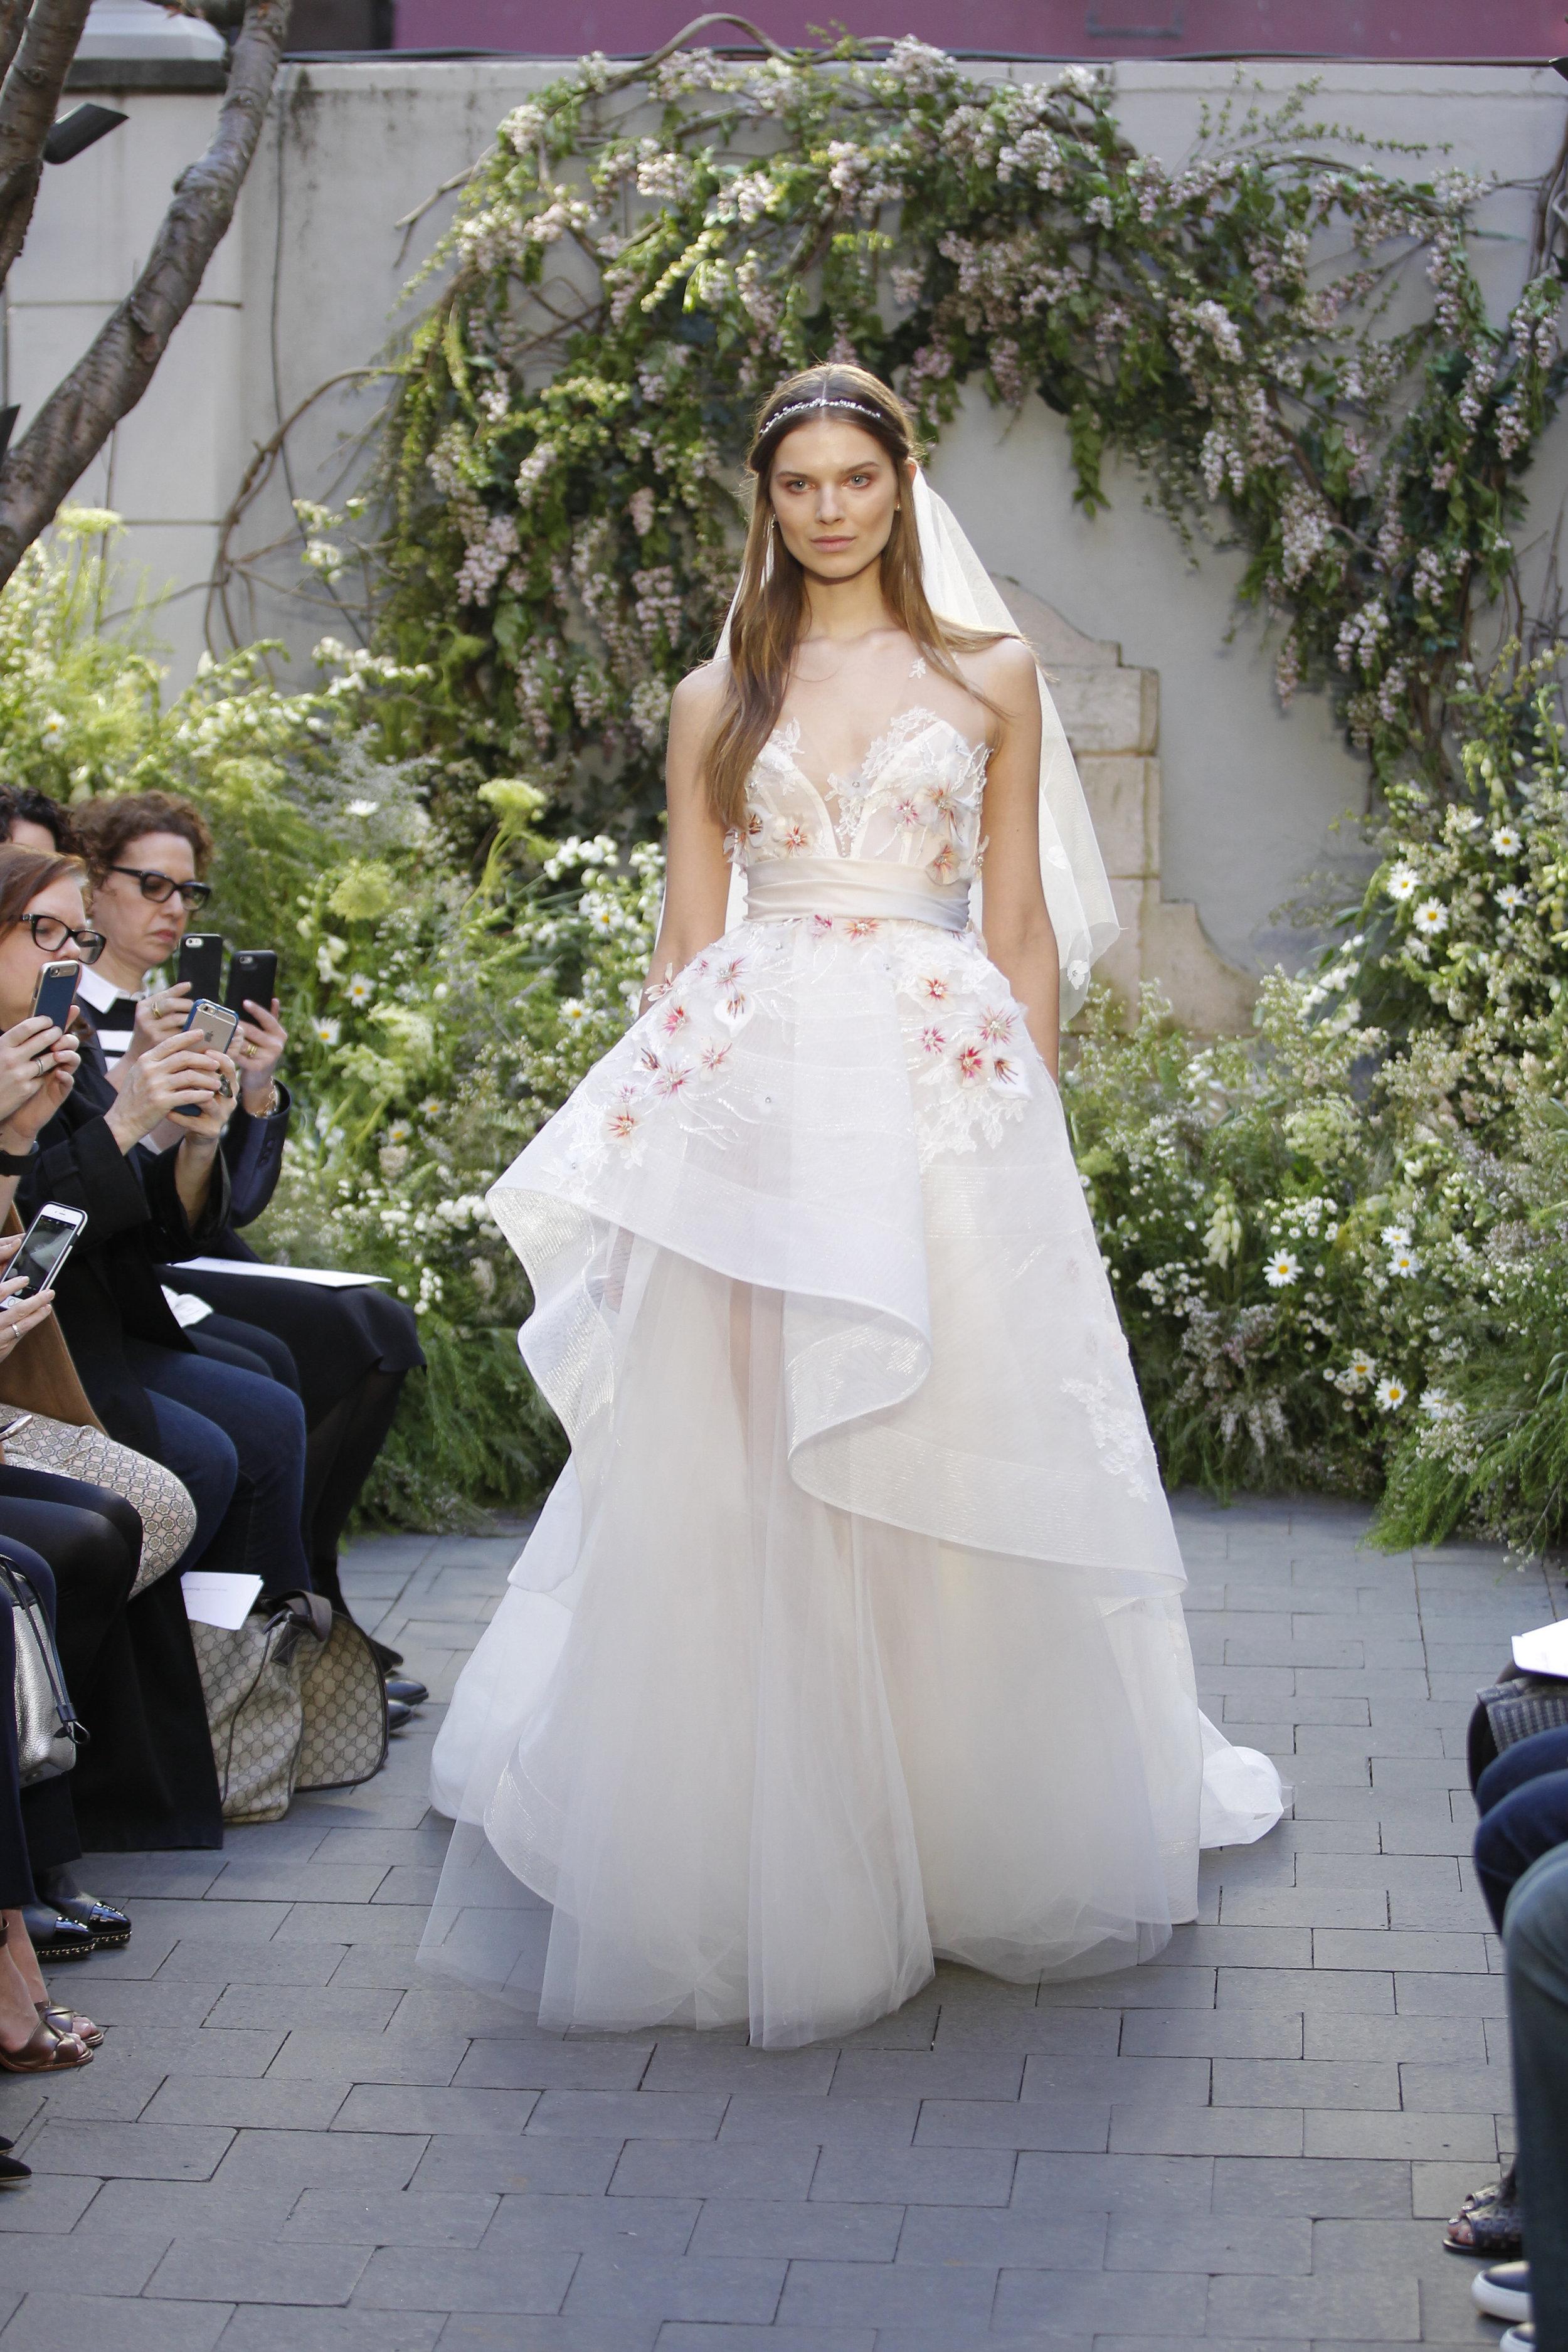 monique huilier floral wedding dress in pensacola